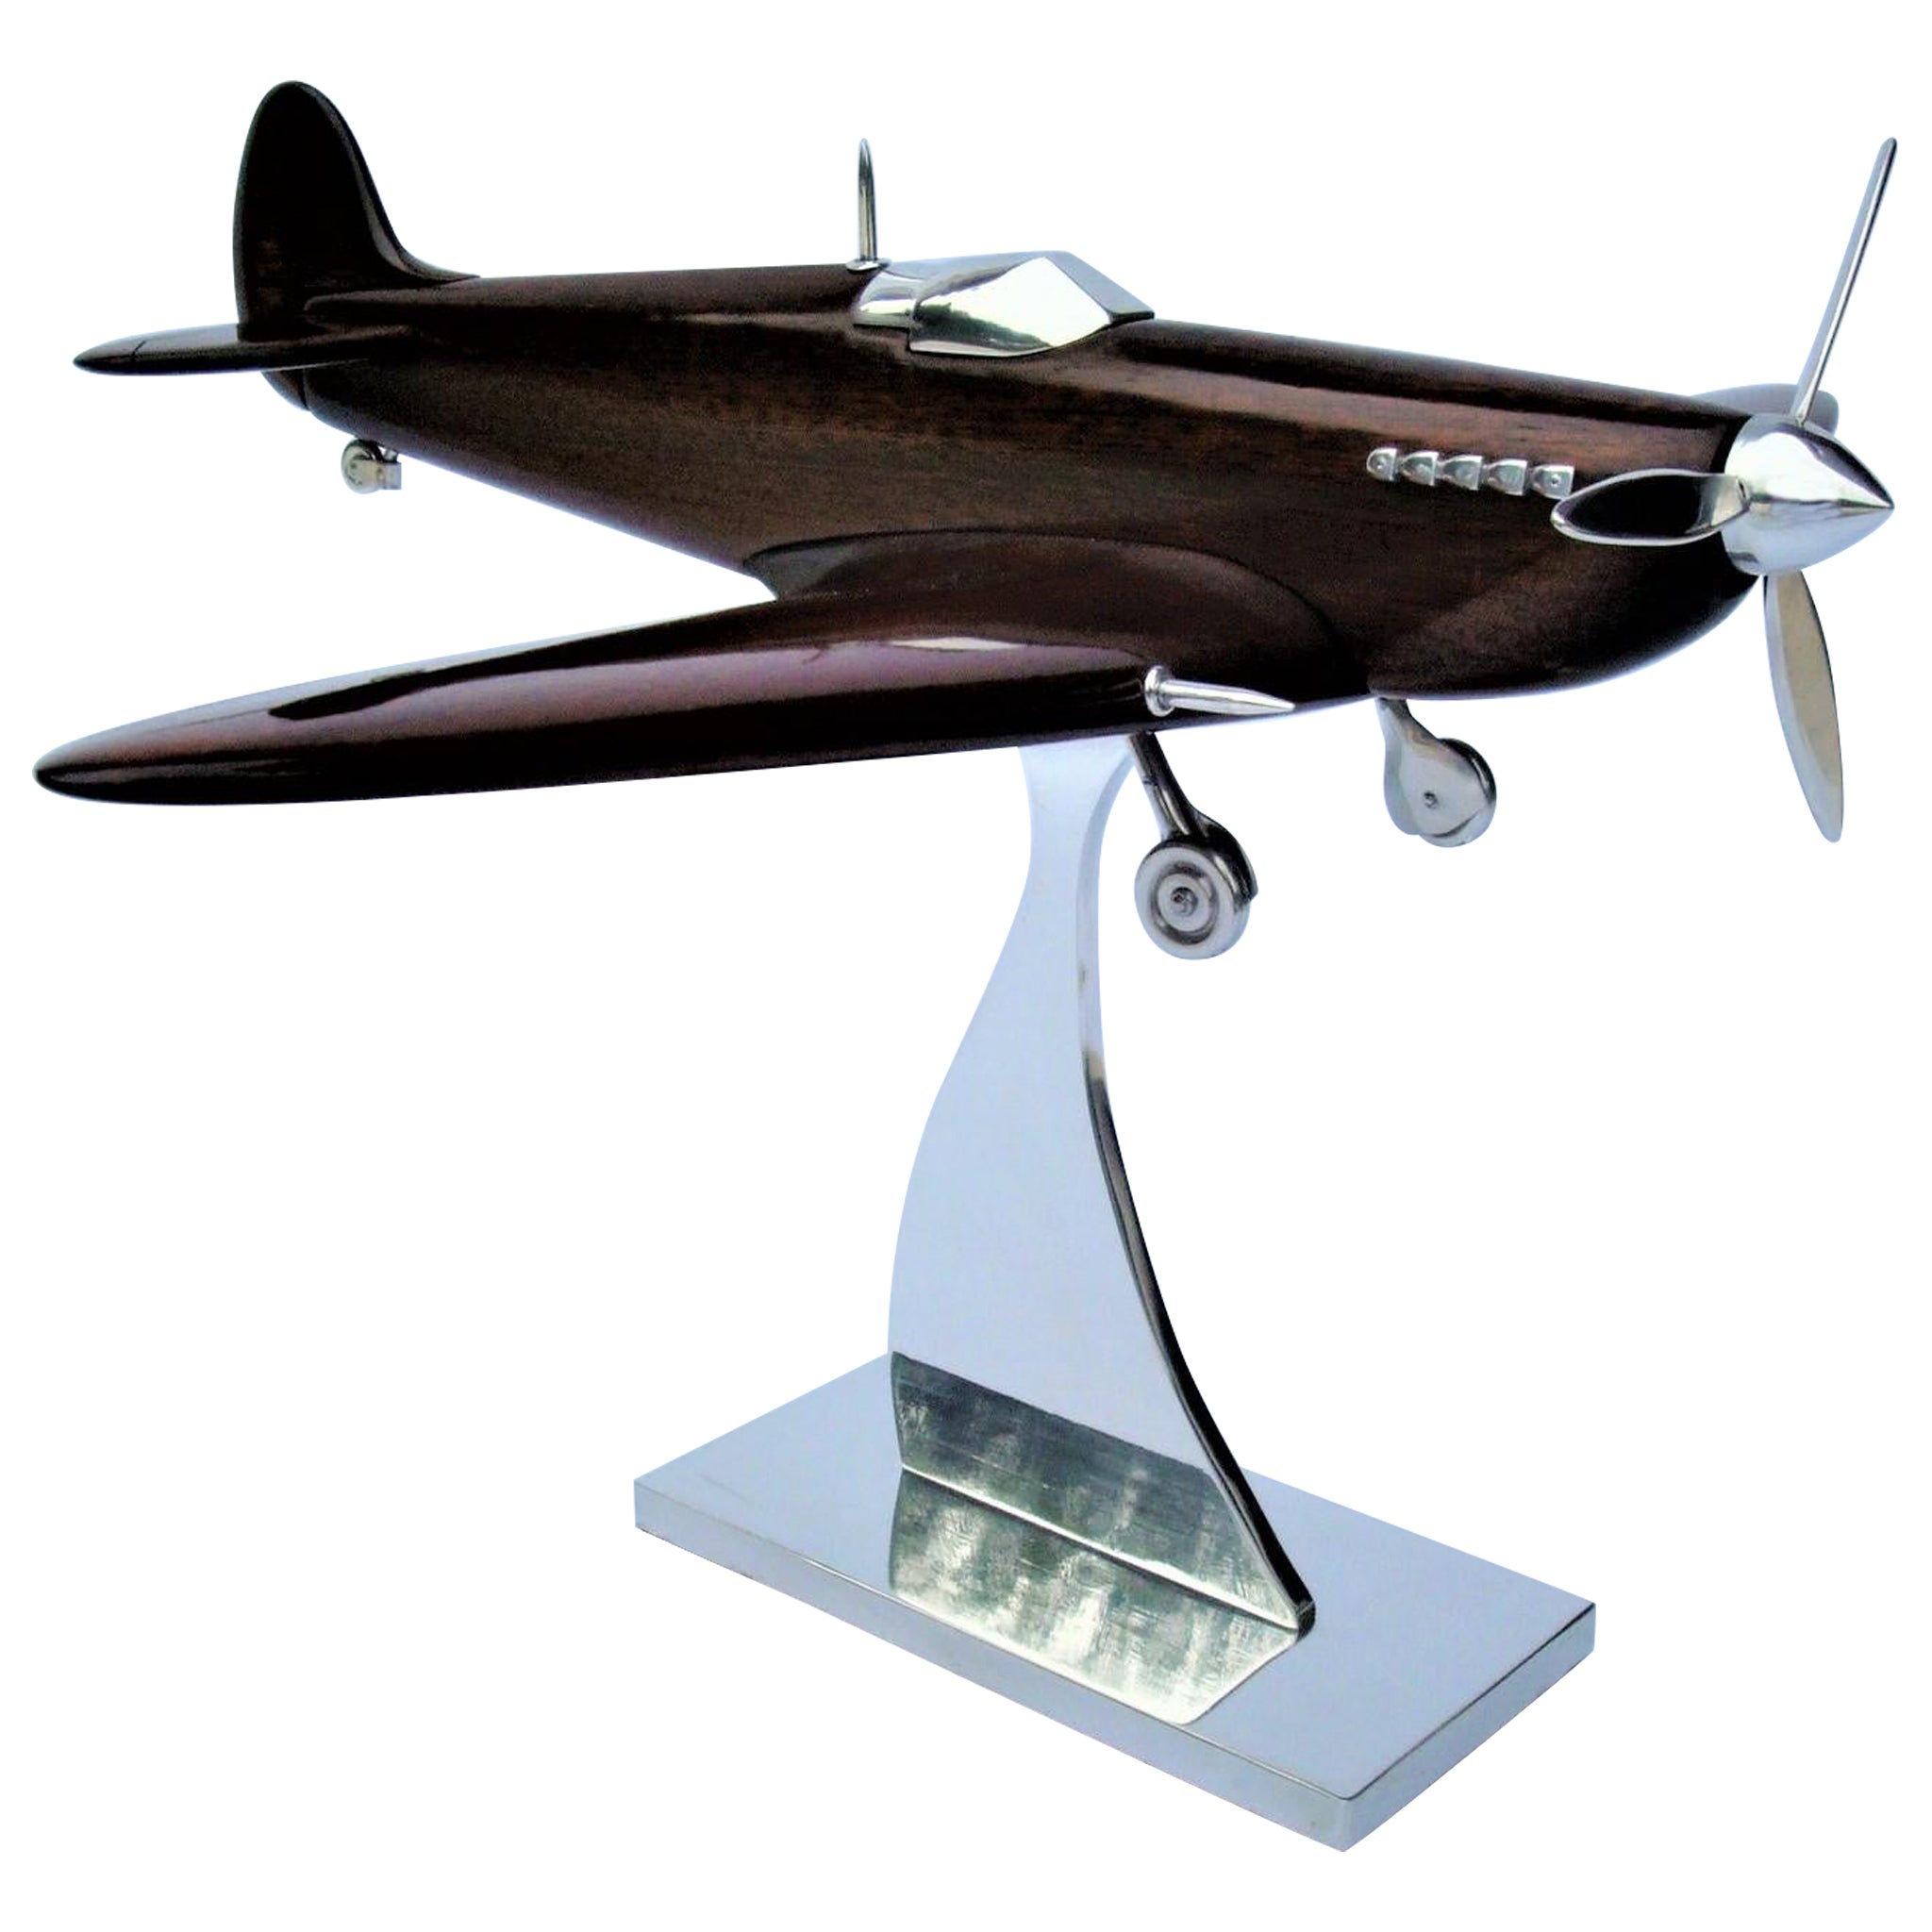 Supermarine Spitfire Wooden & Aluminum Airplane Desk Model, Asprey, ca 1940's